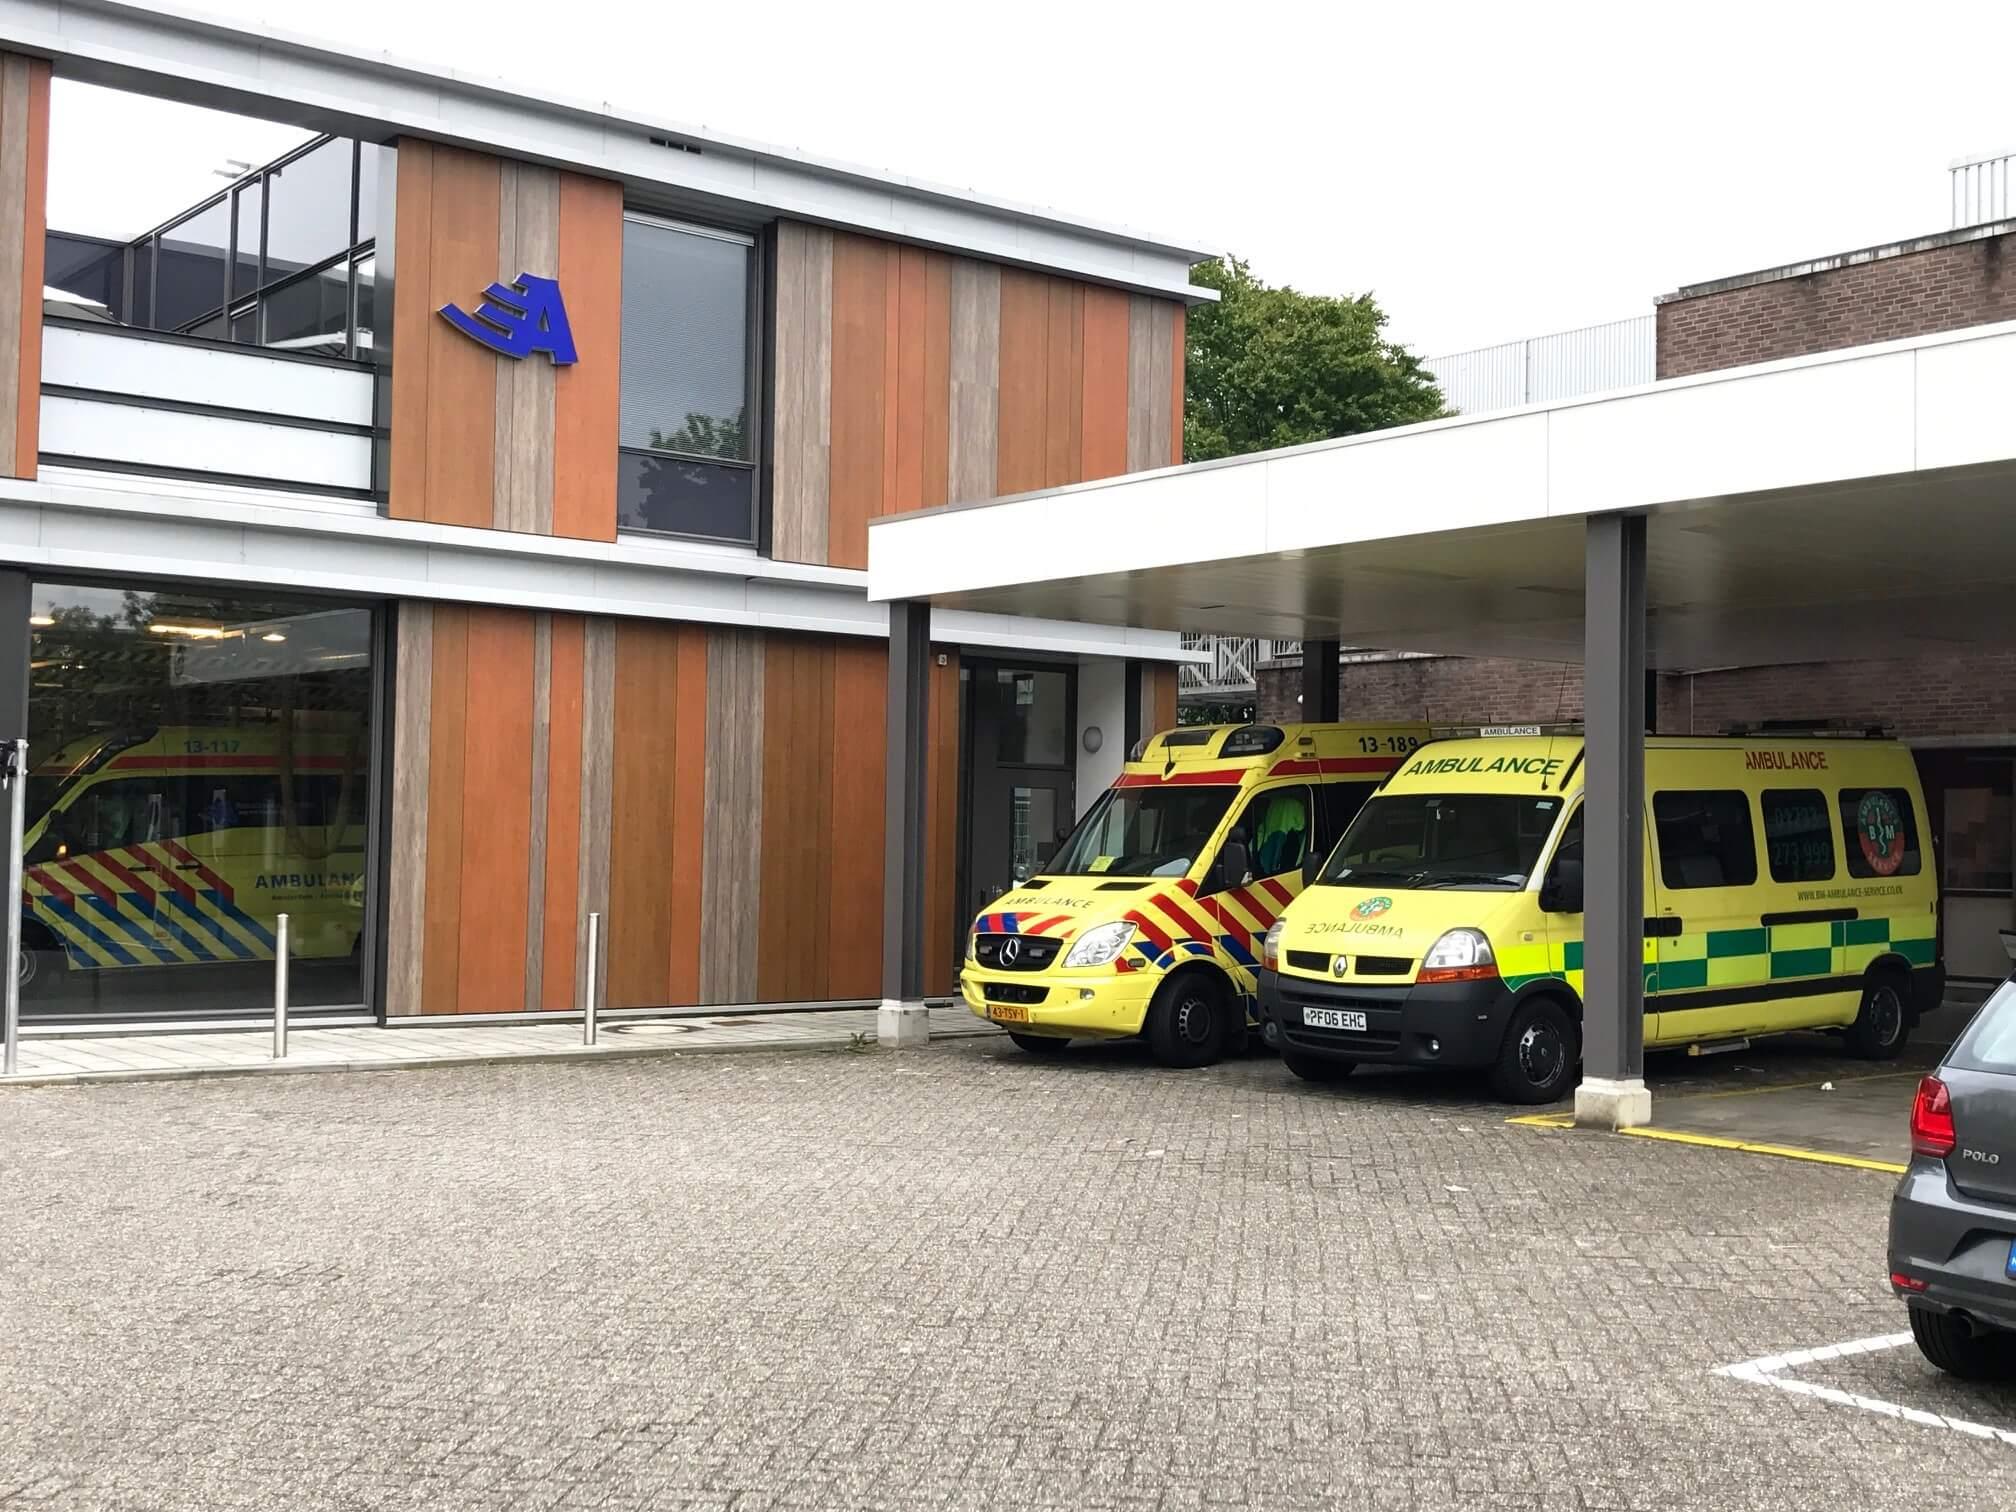 Ambulance Repatriation, Amsterdam, Netherlands